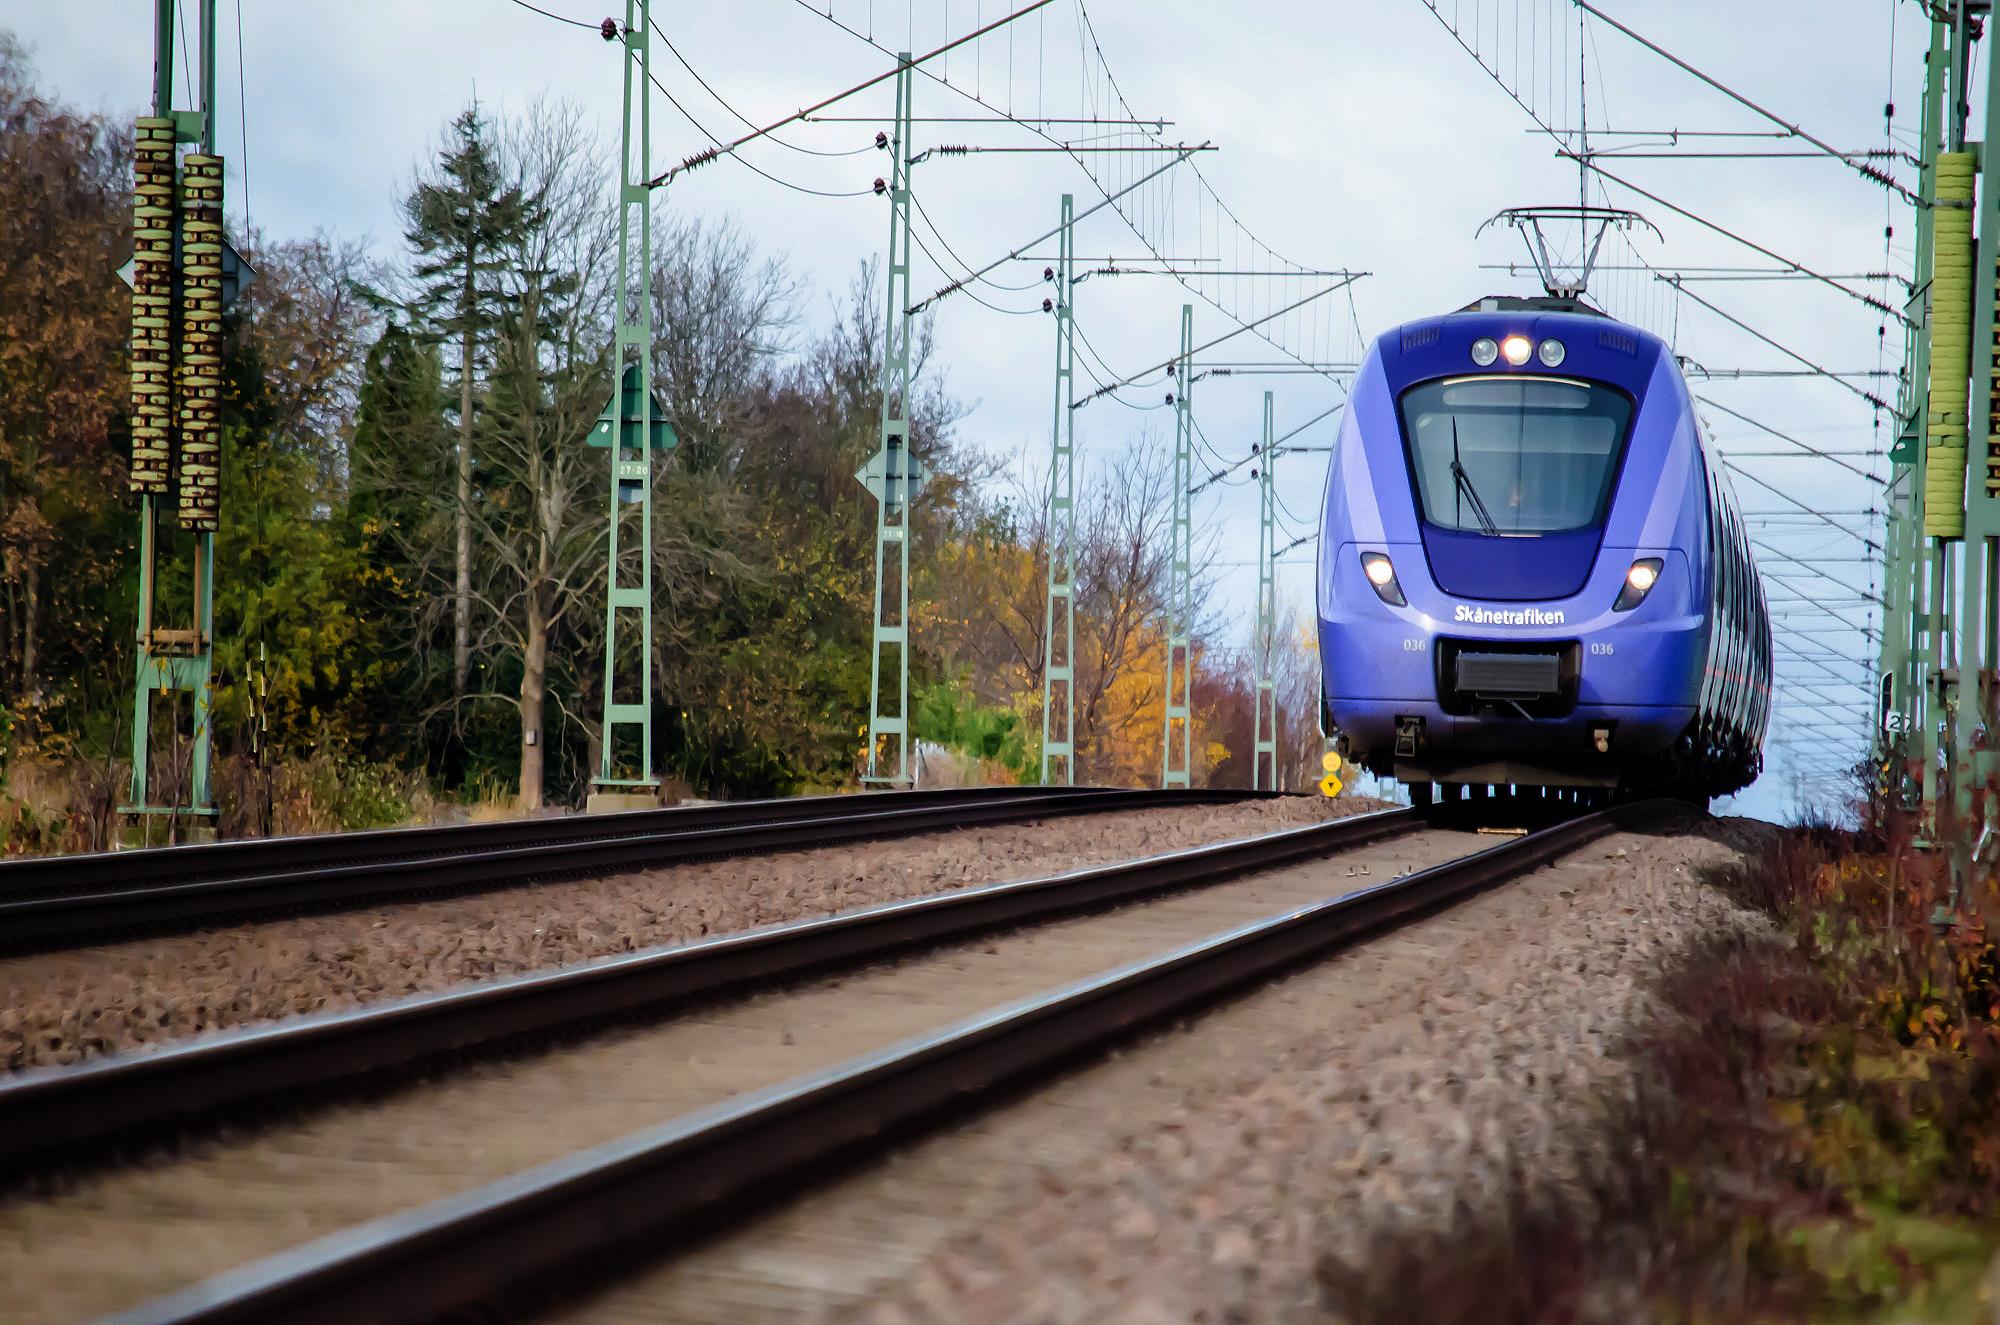 DB Arriva in Sweden